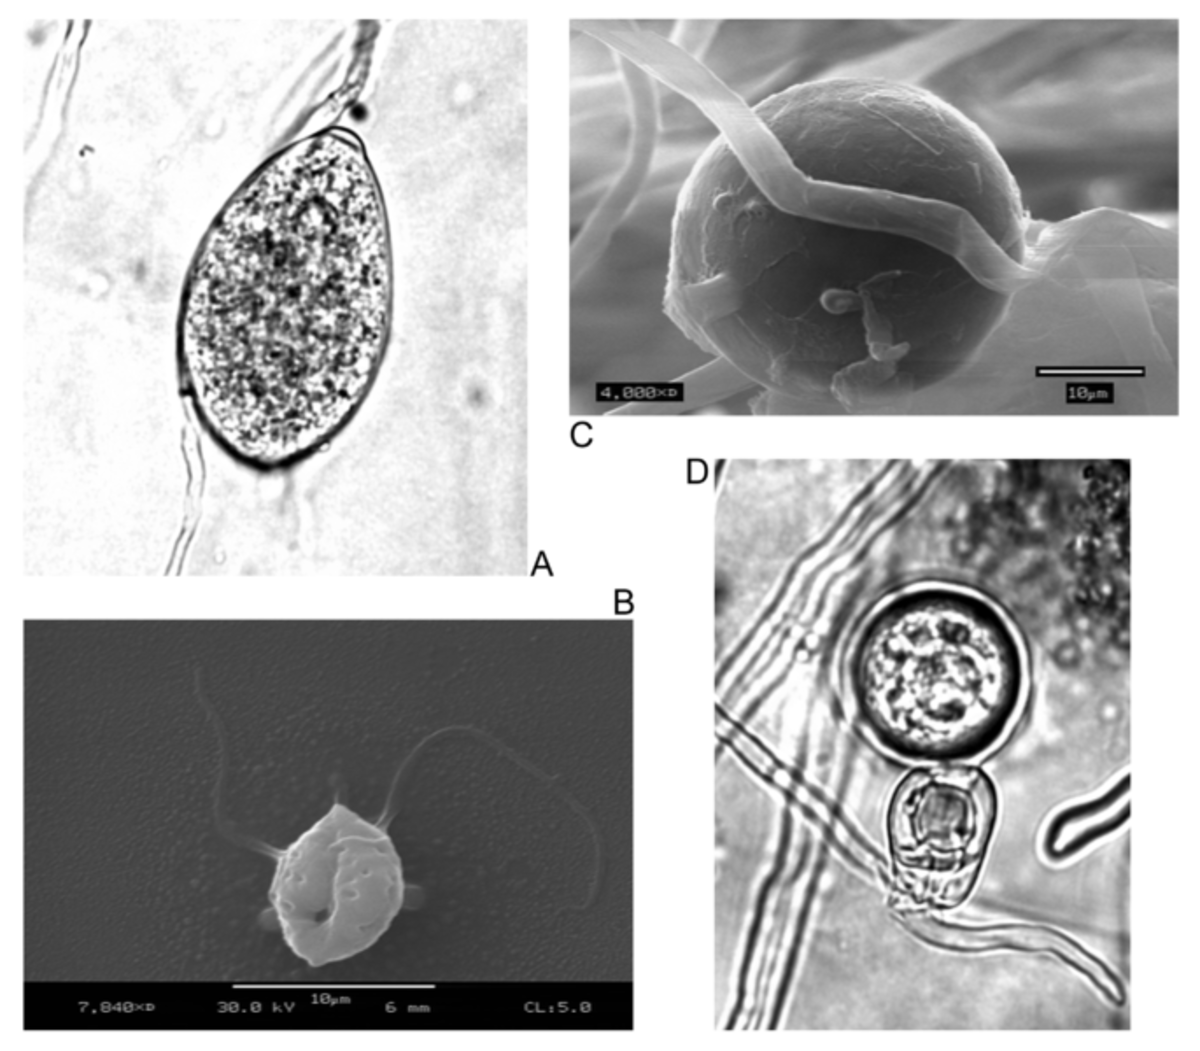 (A) Sporangia, (B) Zoospores, (C) Chlamydospores, (D) Oospores.